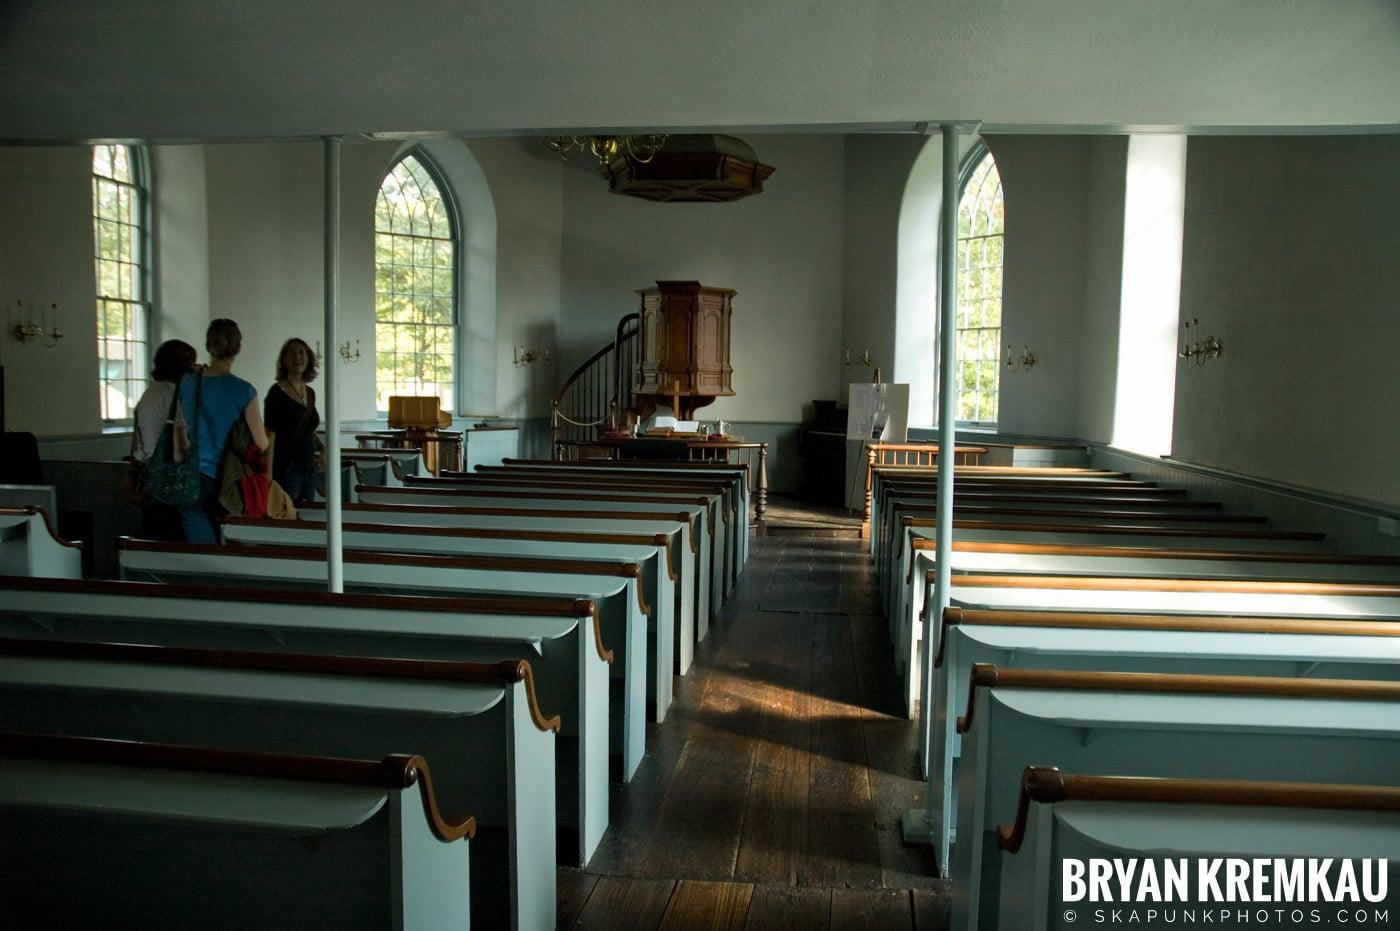 The Old Dutch Church & Lyndhurst Mansion @ Sleepy Hollow/Tarrytown, NY - 10.20.07 (32)